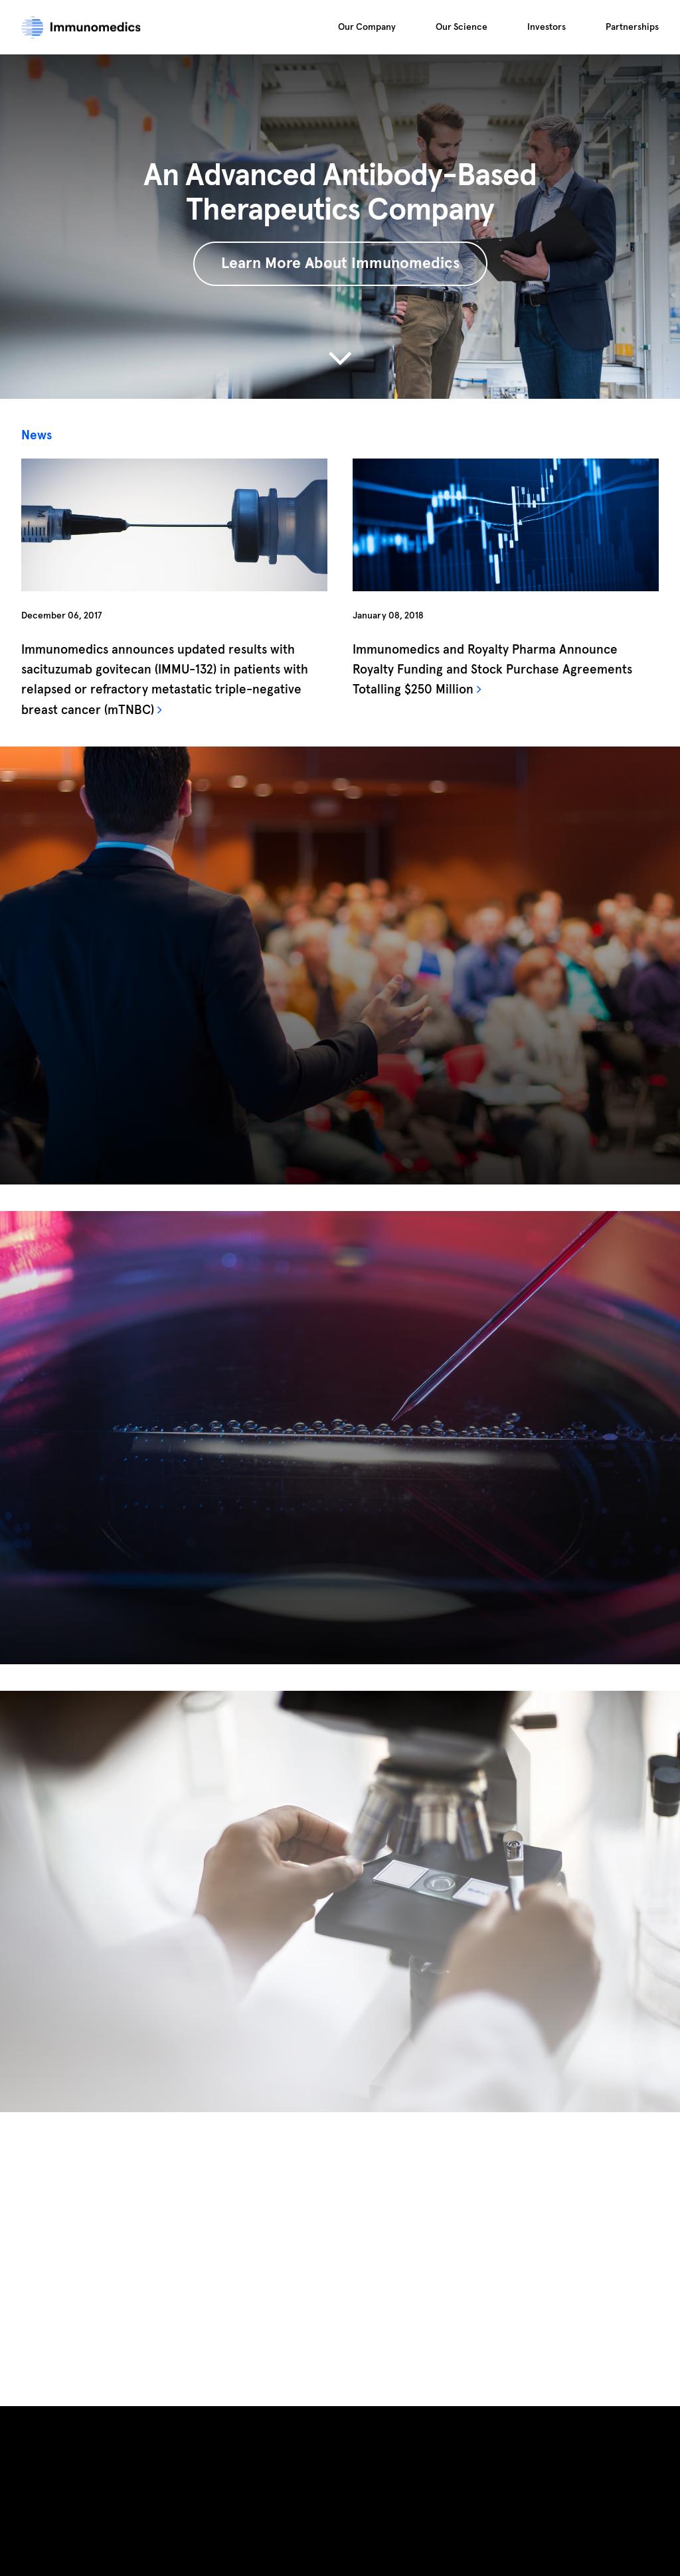 Immunomedics Competitors, Revenue and Employees - Owler Company Profile